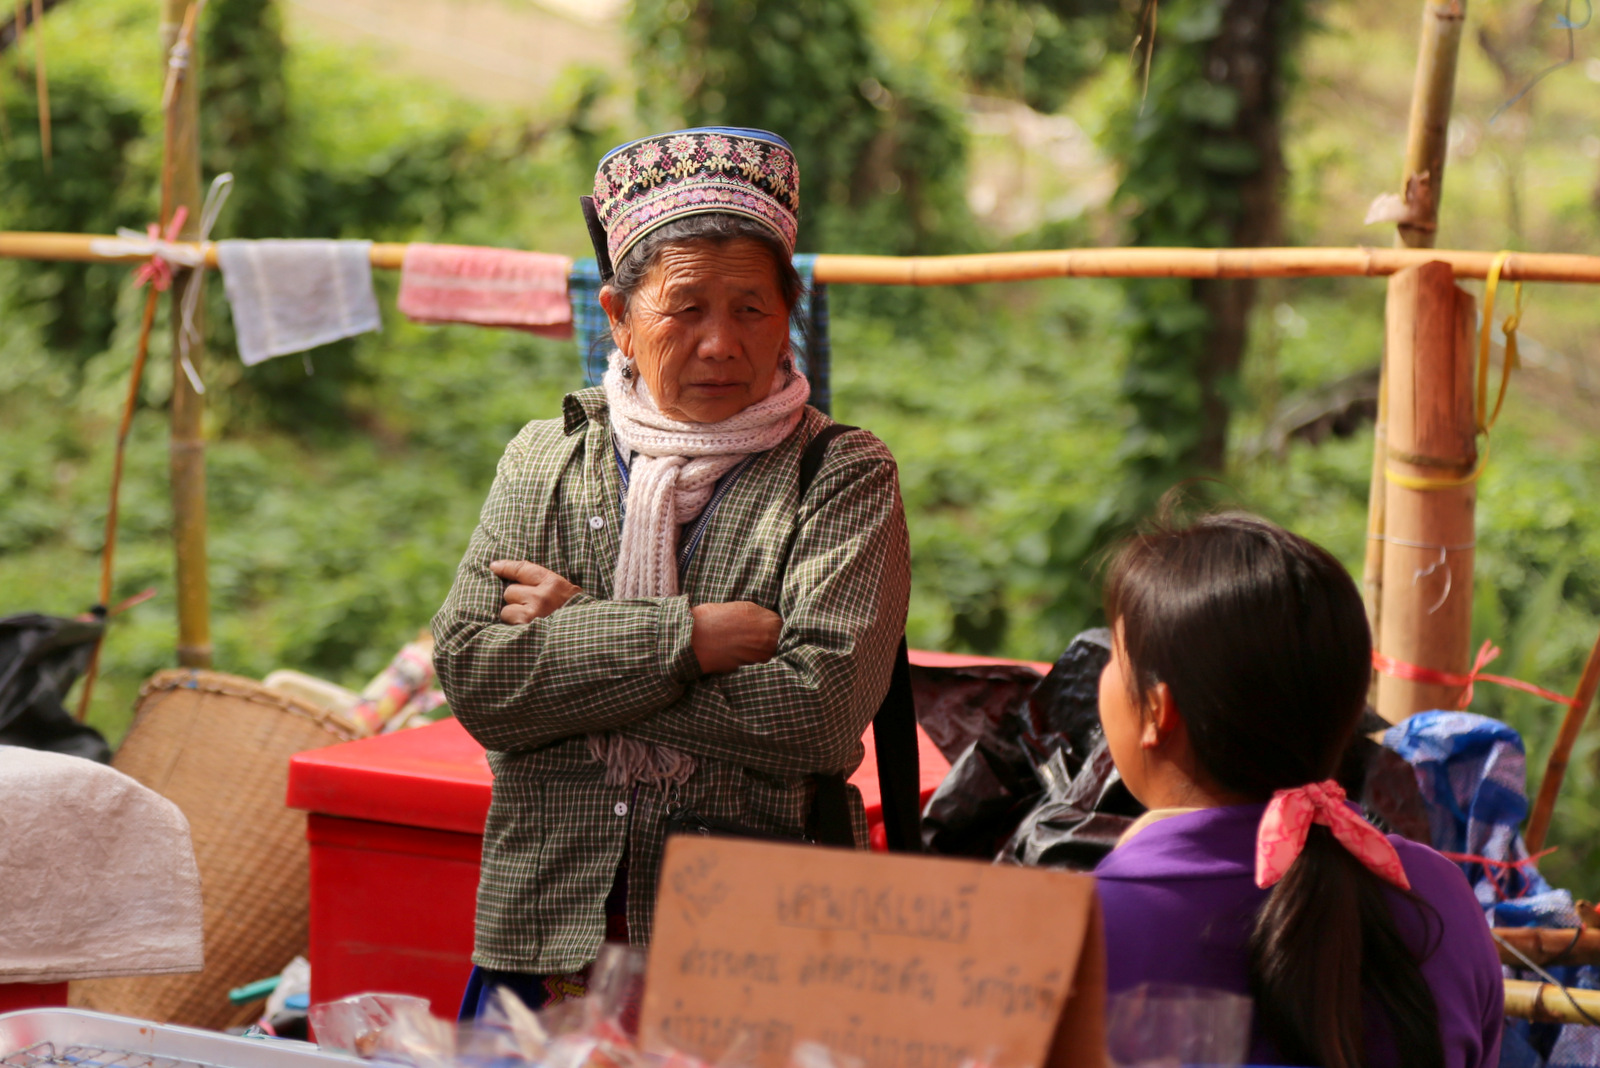 Doi Inthanon market